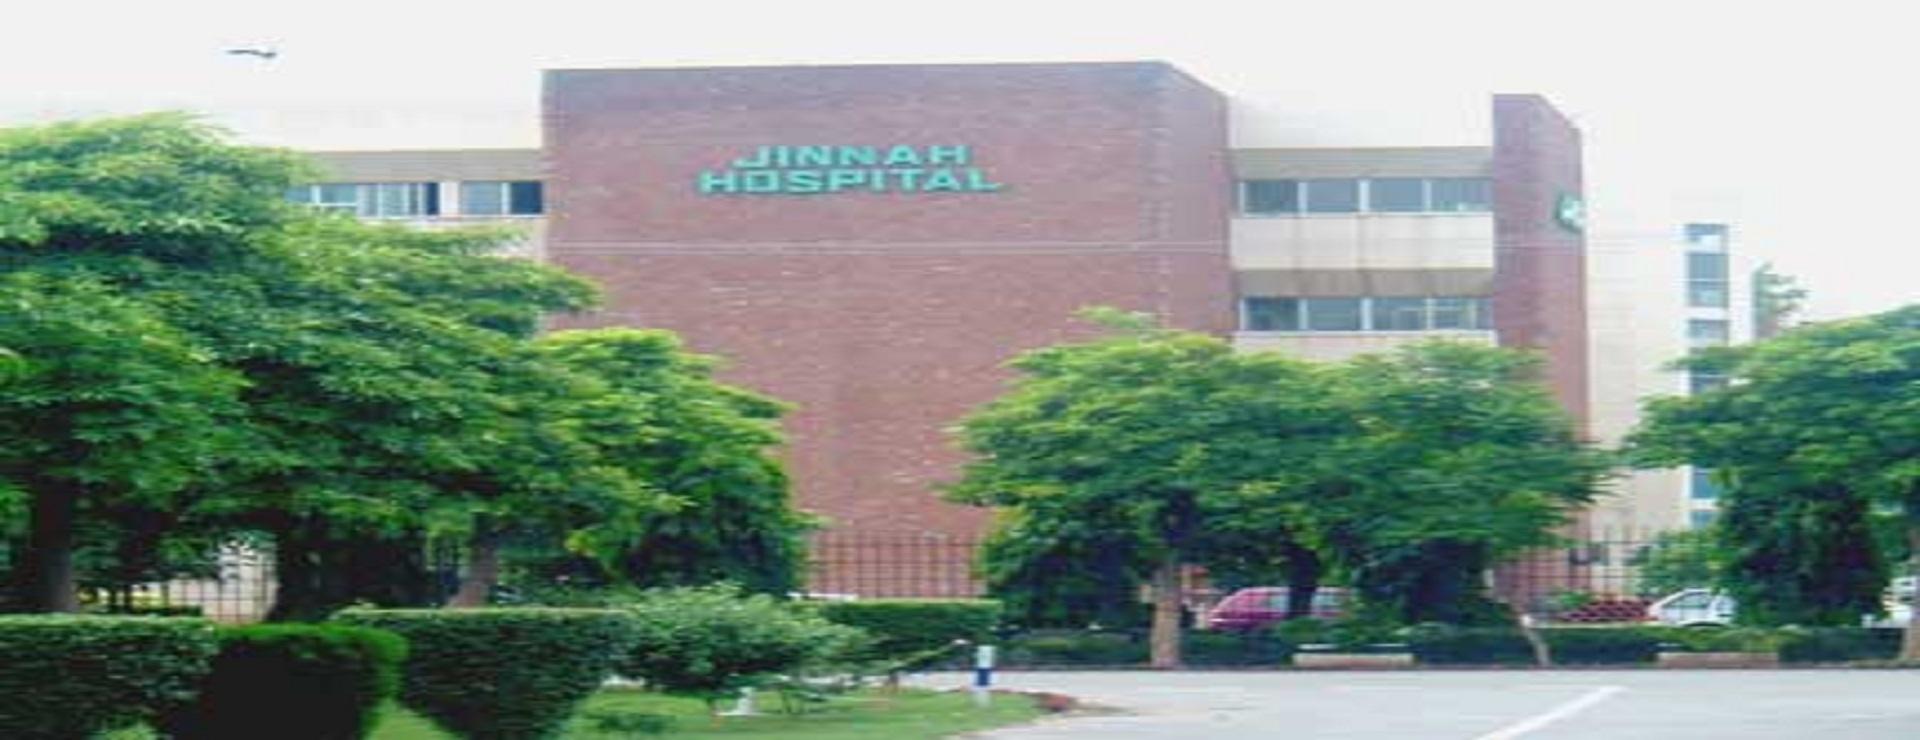 Jinnah hospital front